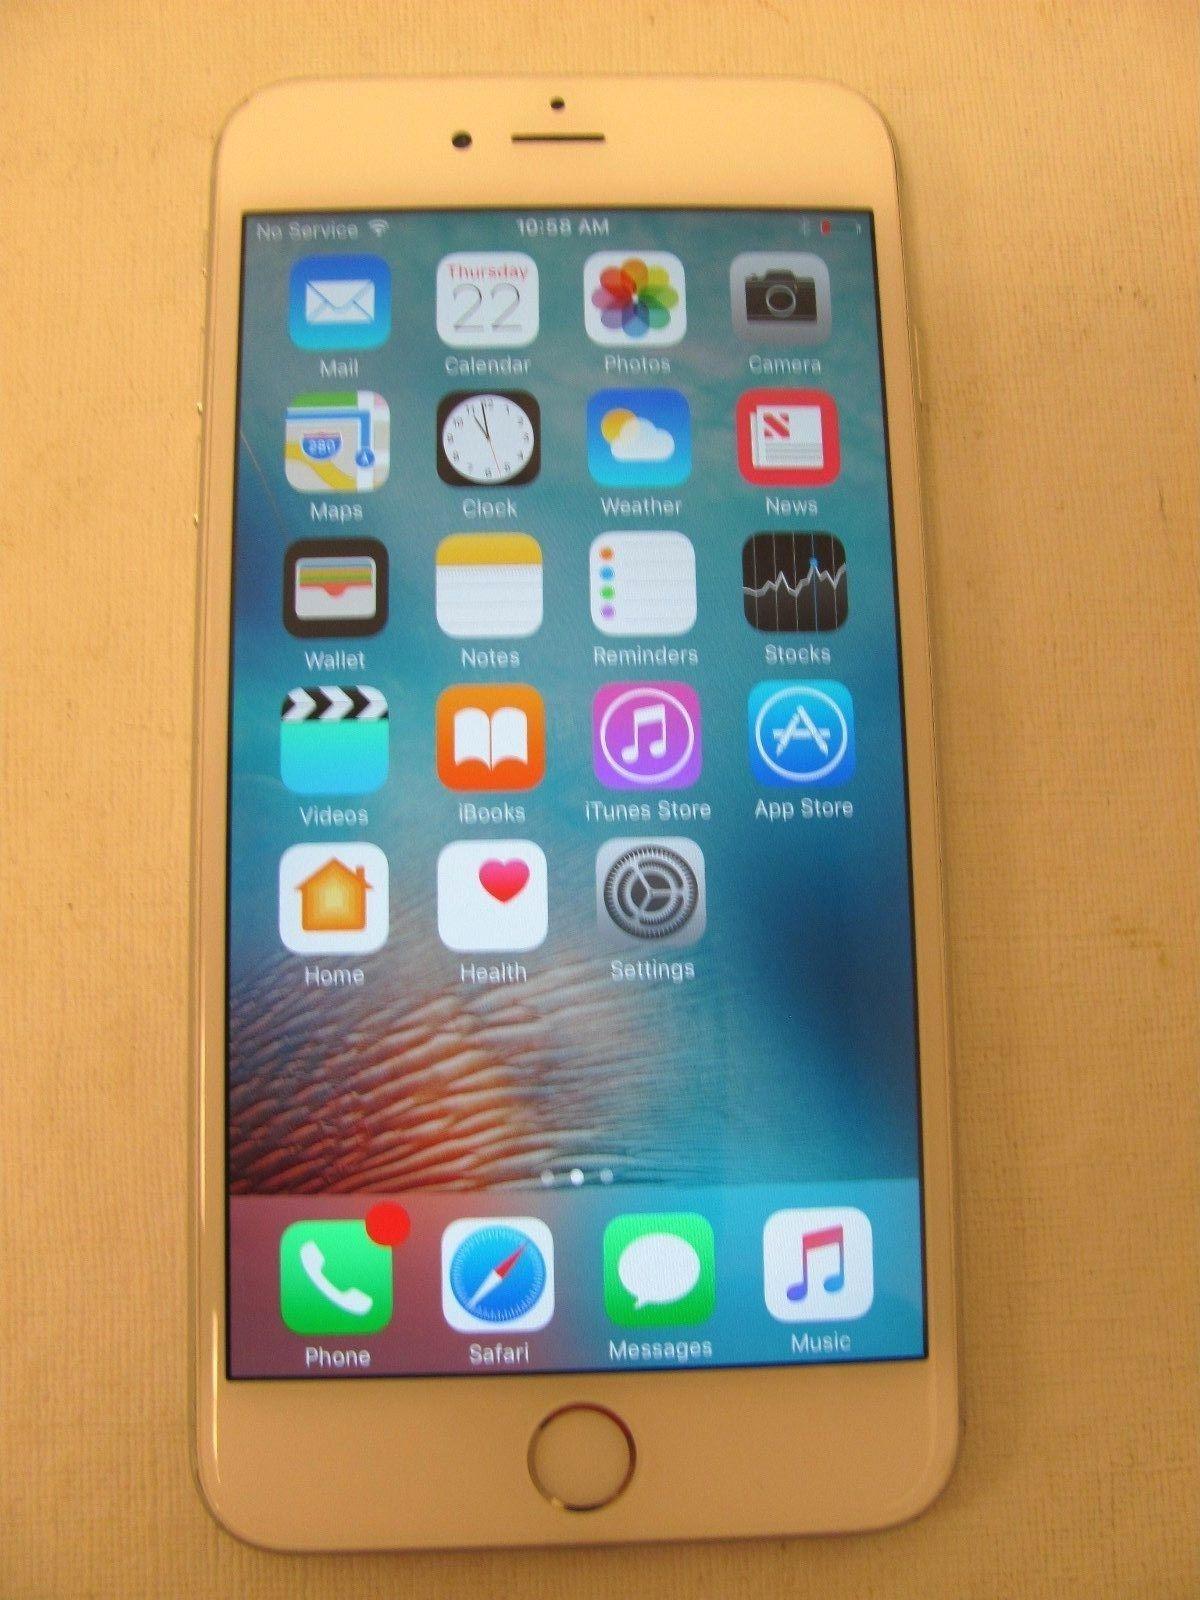 Apple iphone 6s plus latest model 16gb white silver